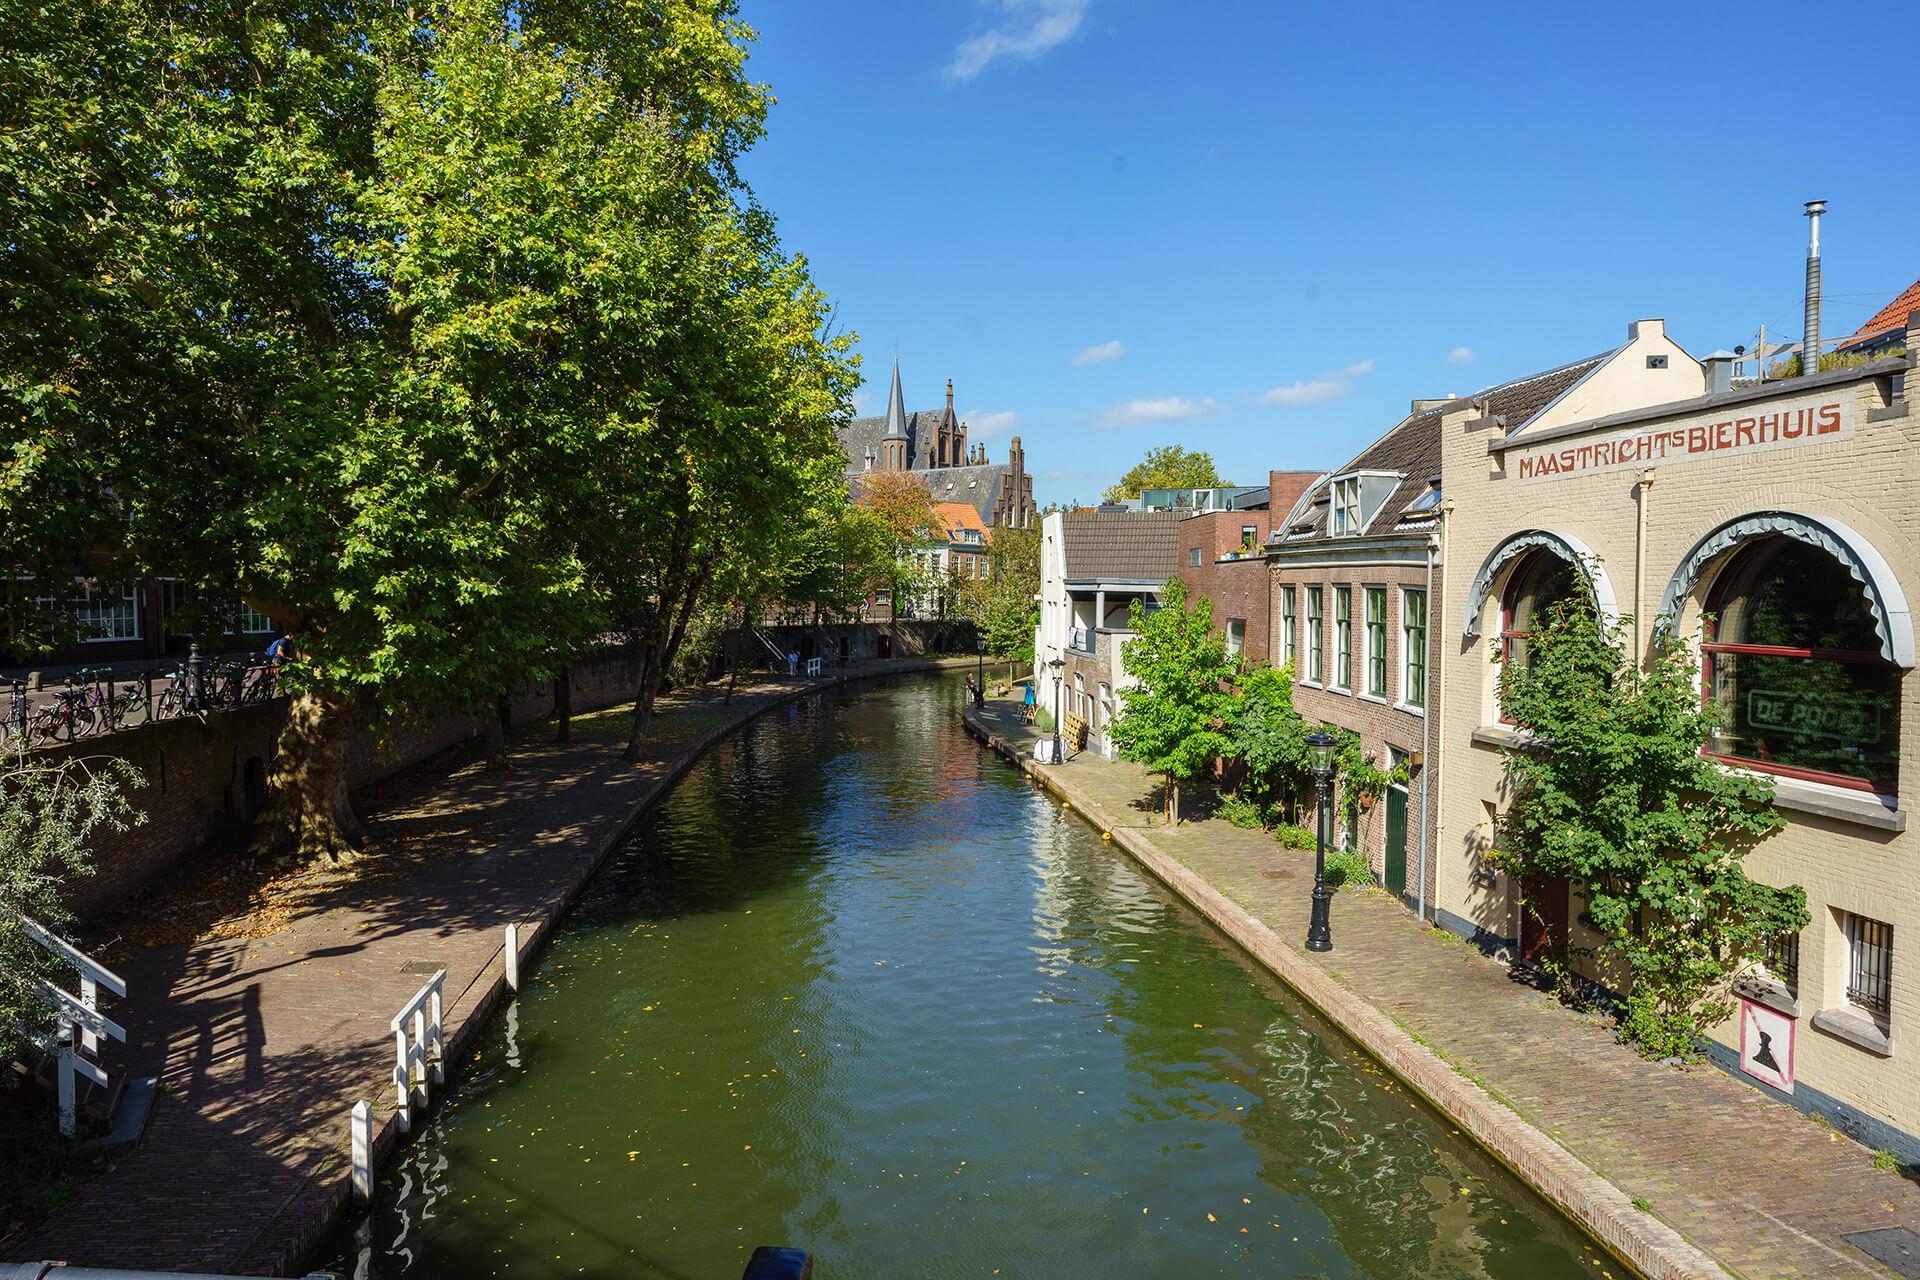 Площадь Старого канала 12 века (Аудеграхт)